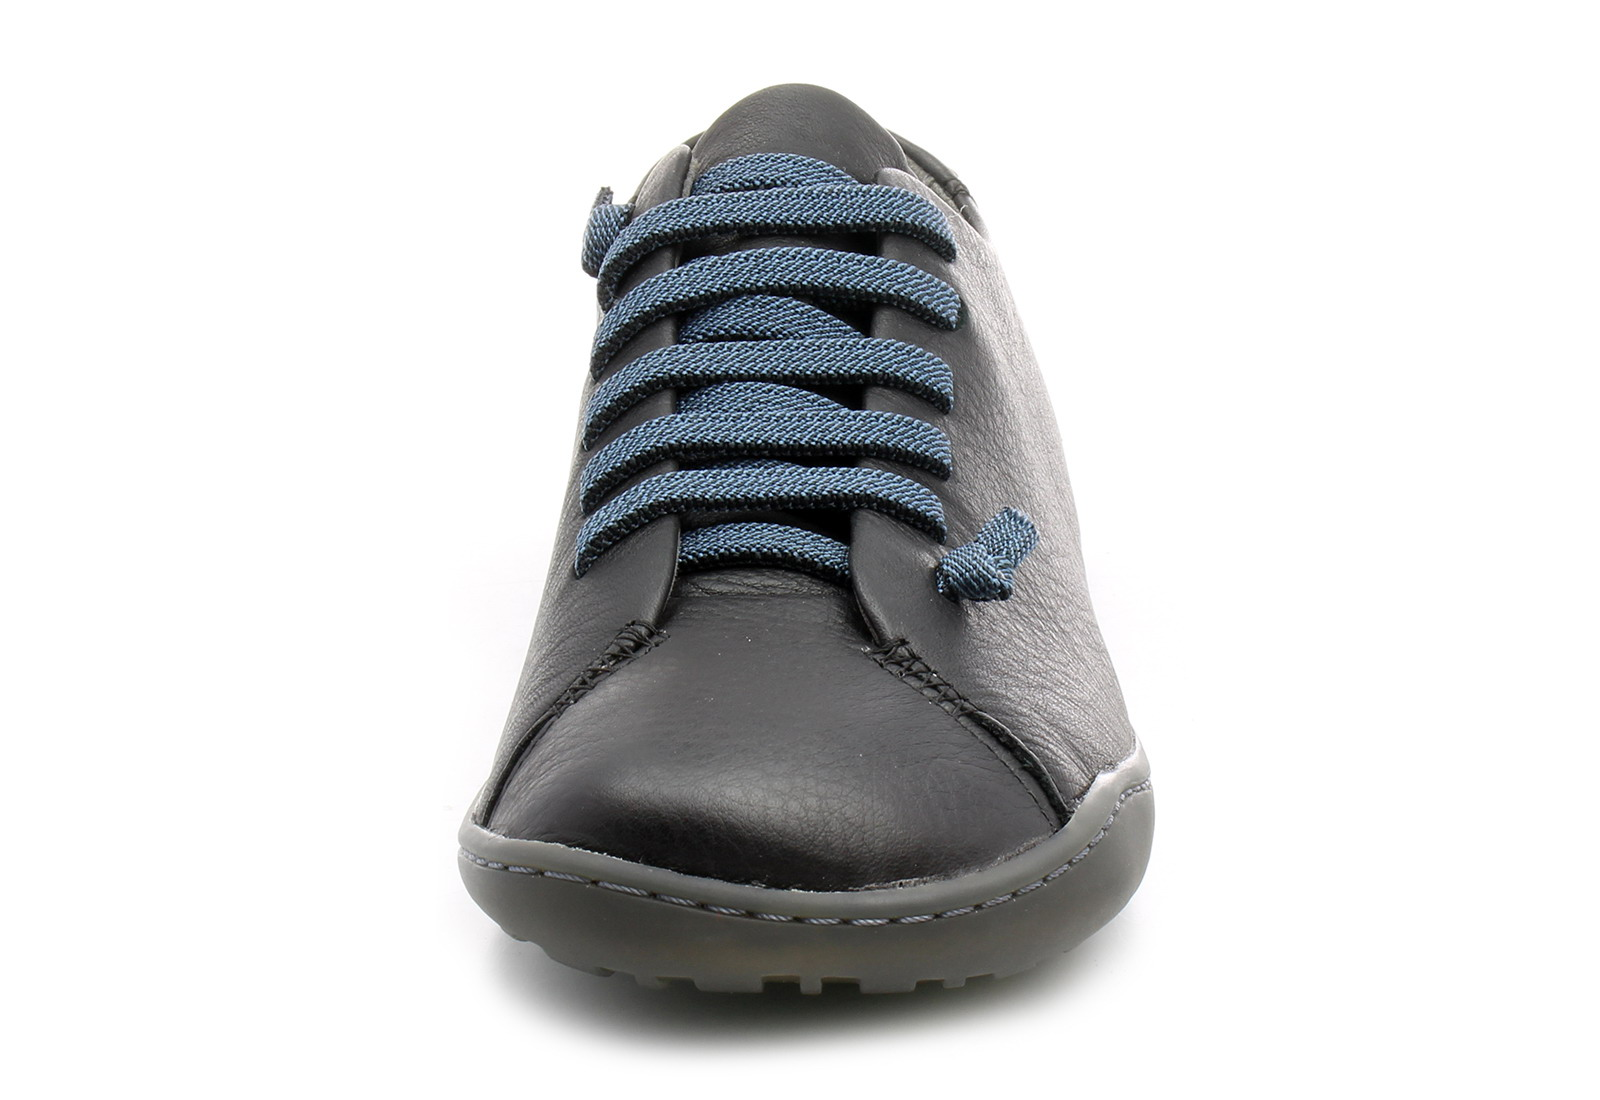 e6b65cc2ec Camper Cipő - Peu Cami - K200514-005 - Office Shoes Magyarország